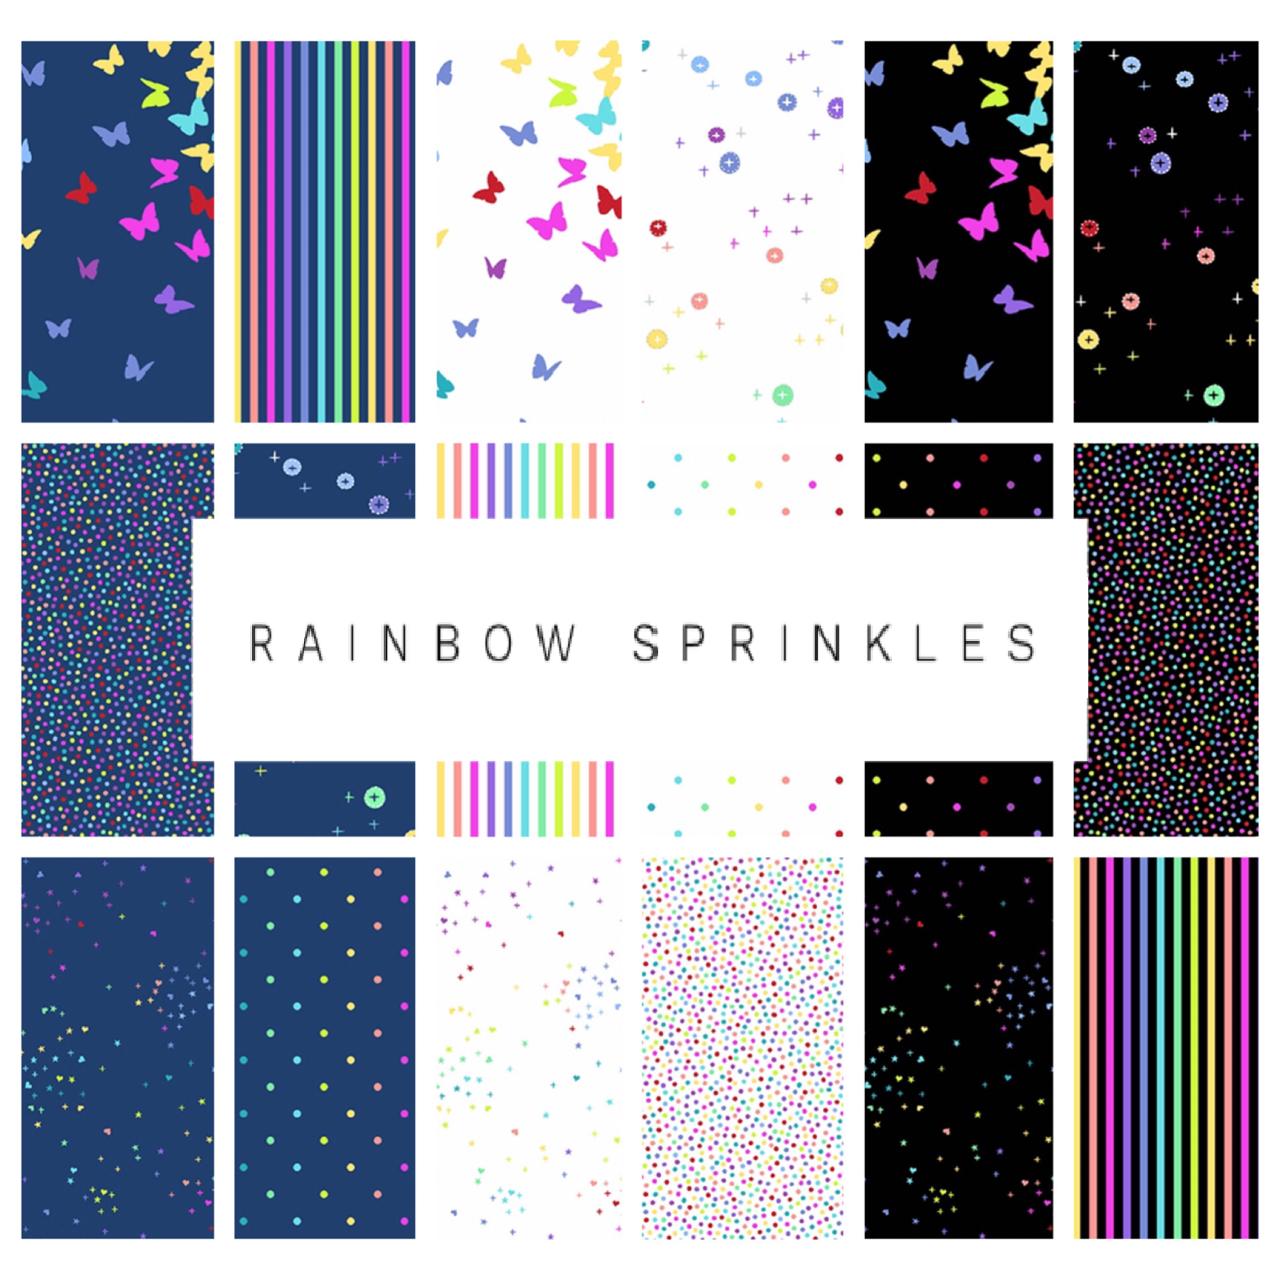 Rainbow Sprinkles by Andover Fabrics